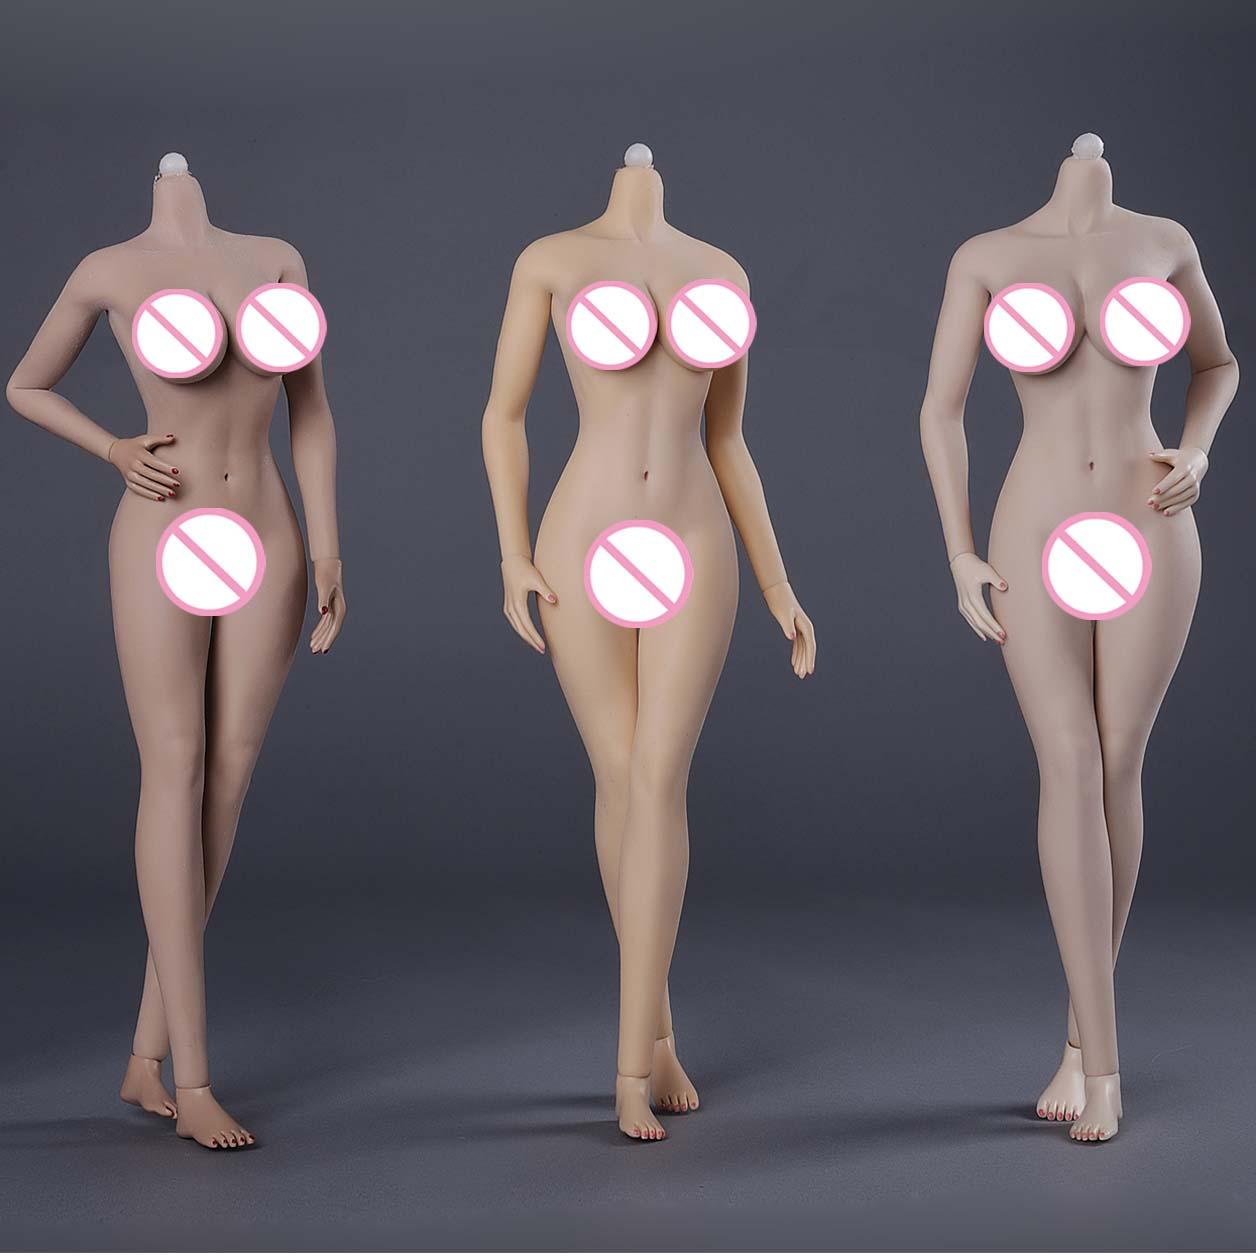 JIAOU DOLL 3 0 1 6 Scale Figure Super Flexible European Shape Big bust Female Seamless